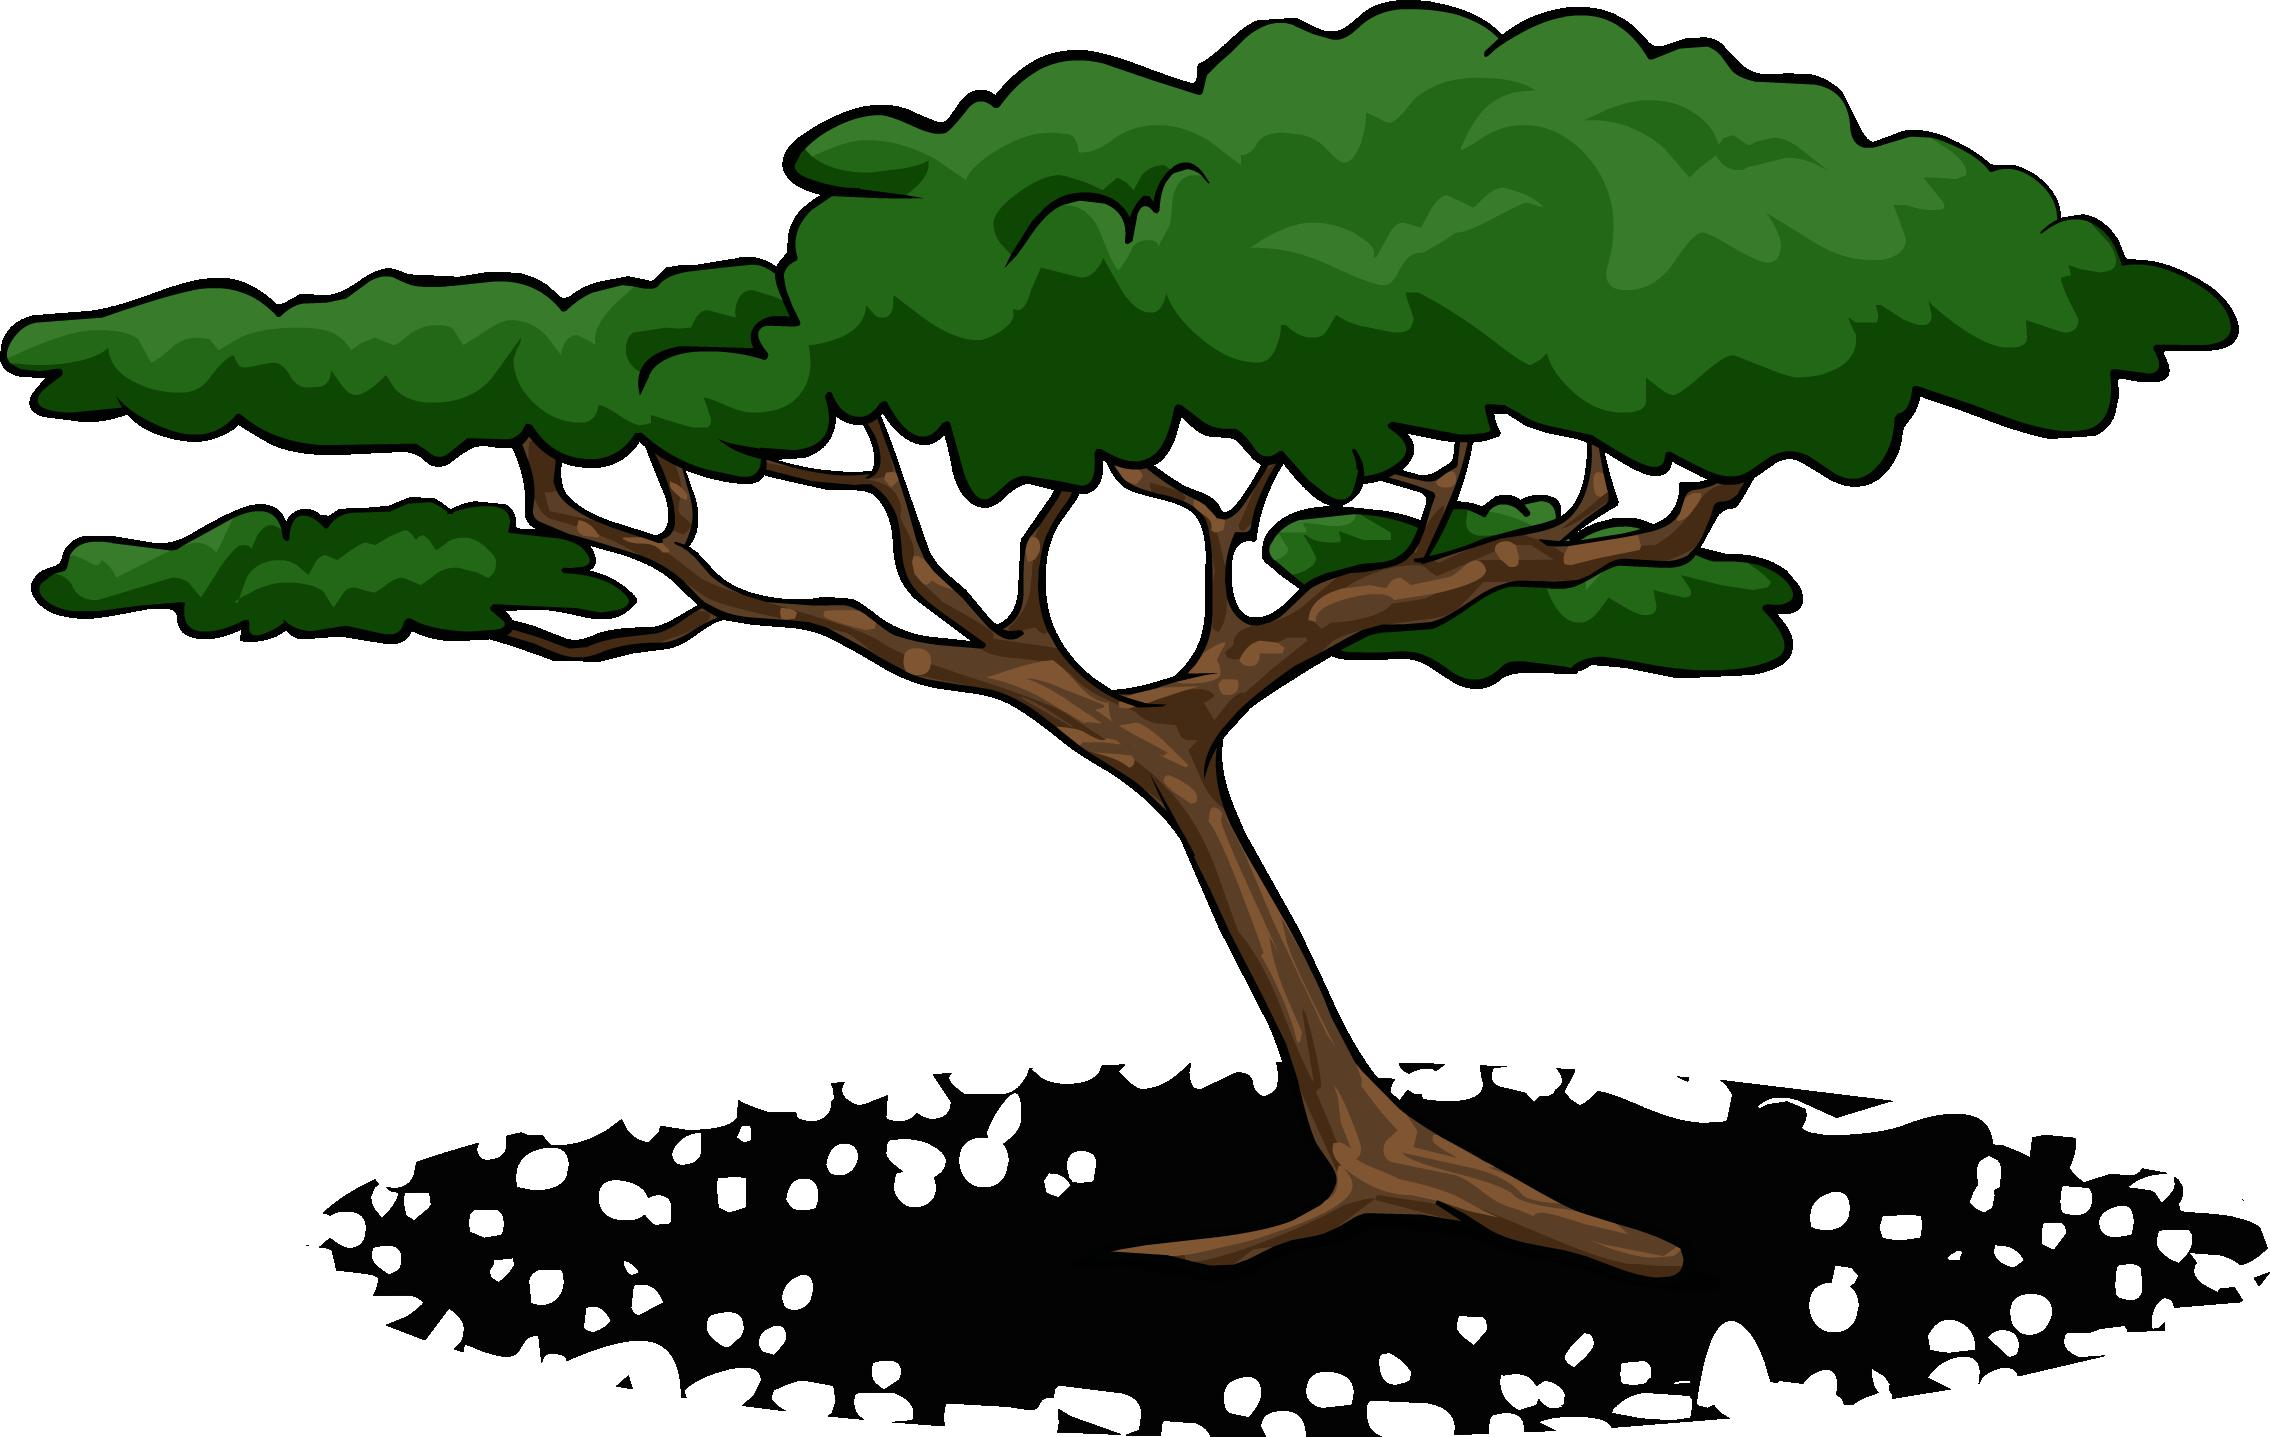 Savanna tree clipart svg transparent library Image - Acacia Tree sprite 002.png | Club Penguin Wiki | FANDOM ... svg transparent library